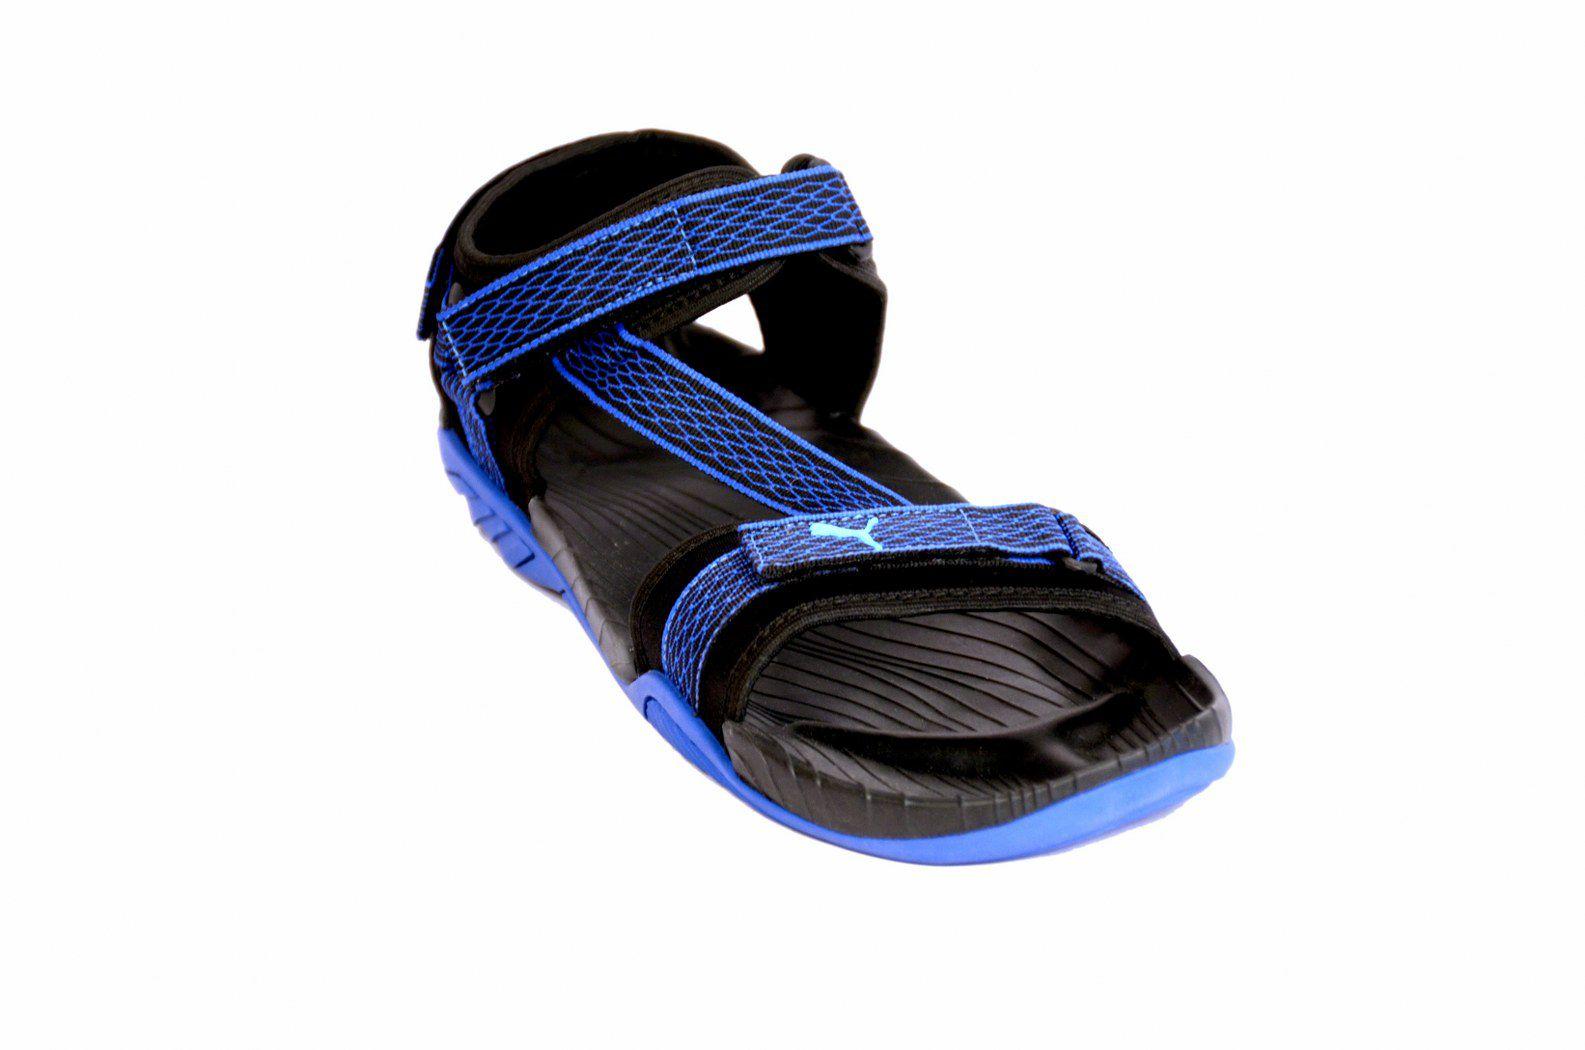 075e42a32cf2 Puma Black-Nrgy Turquoise-Lapis Blue Floater Sandals - Buy Puma Black-Nrgy  Turquoise-Lapis Blue Floater Sandals Online at Best Prices in India on  Snapdeal